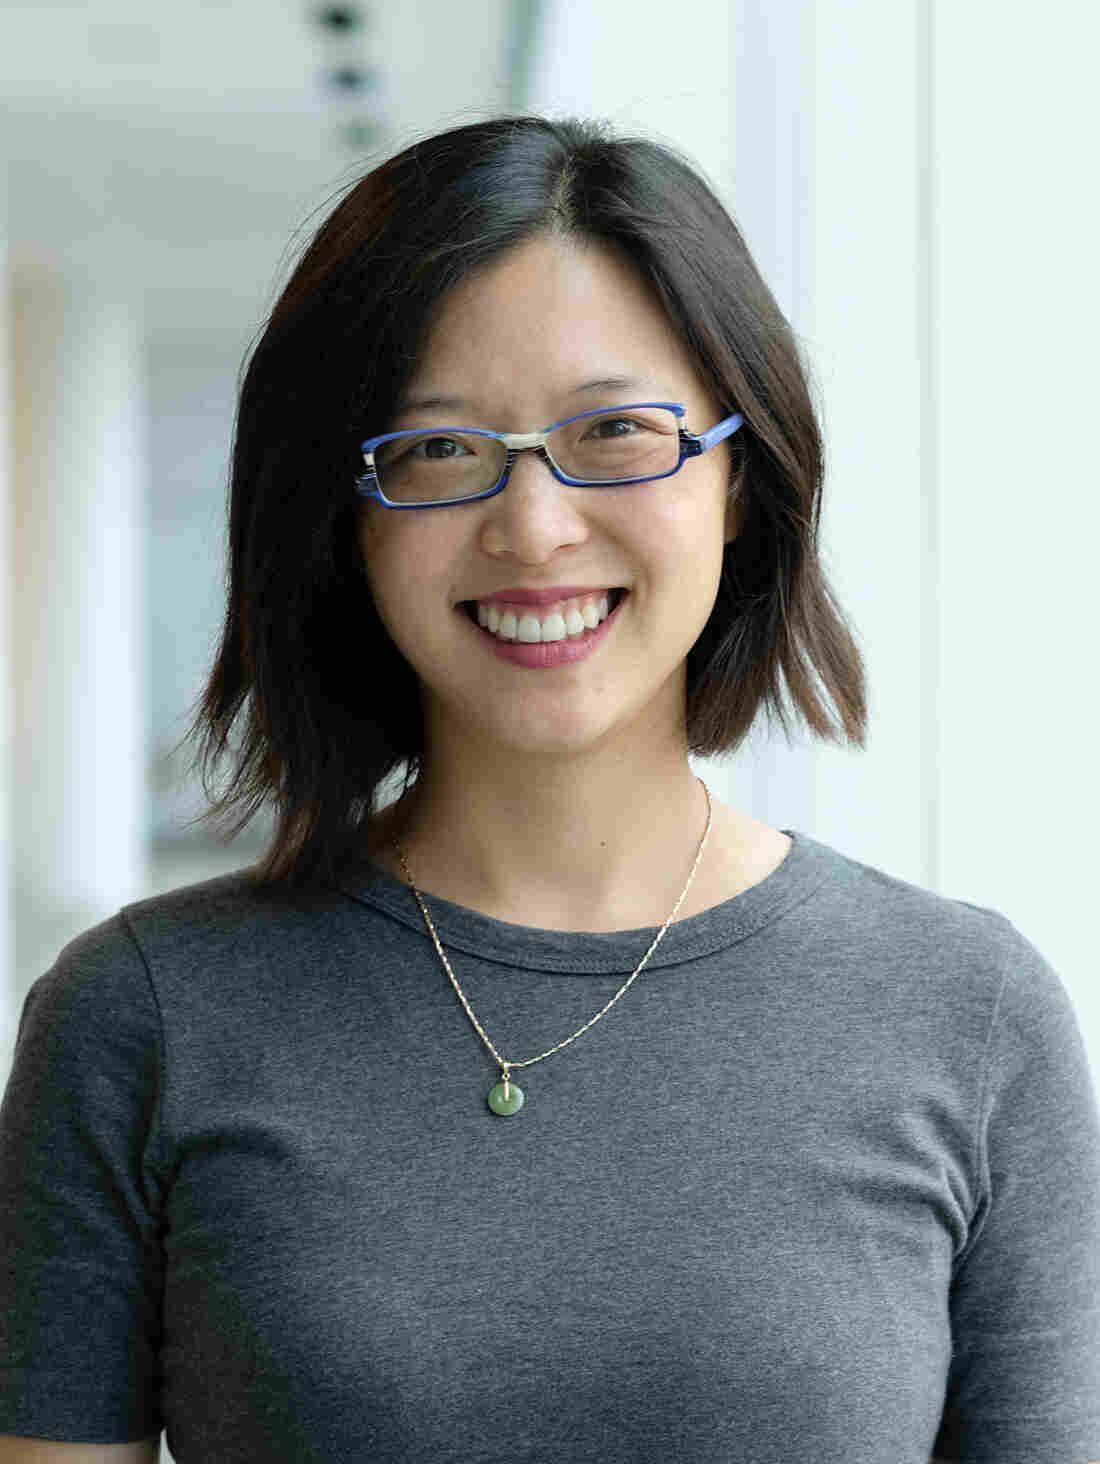 Pien Huang